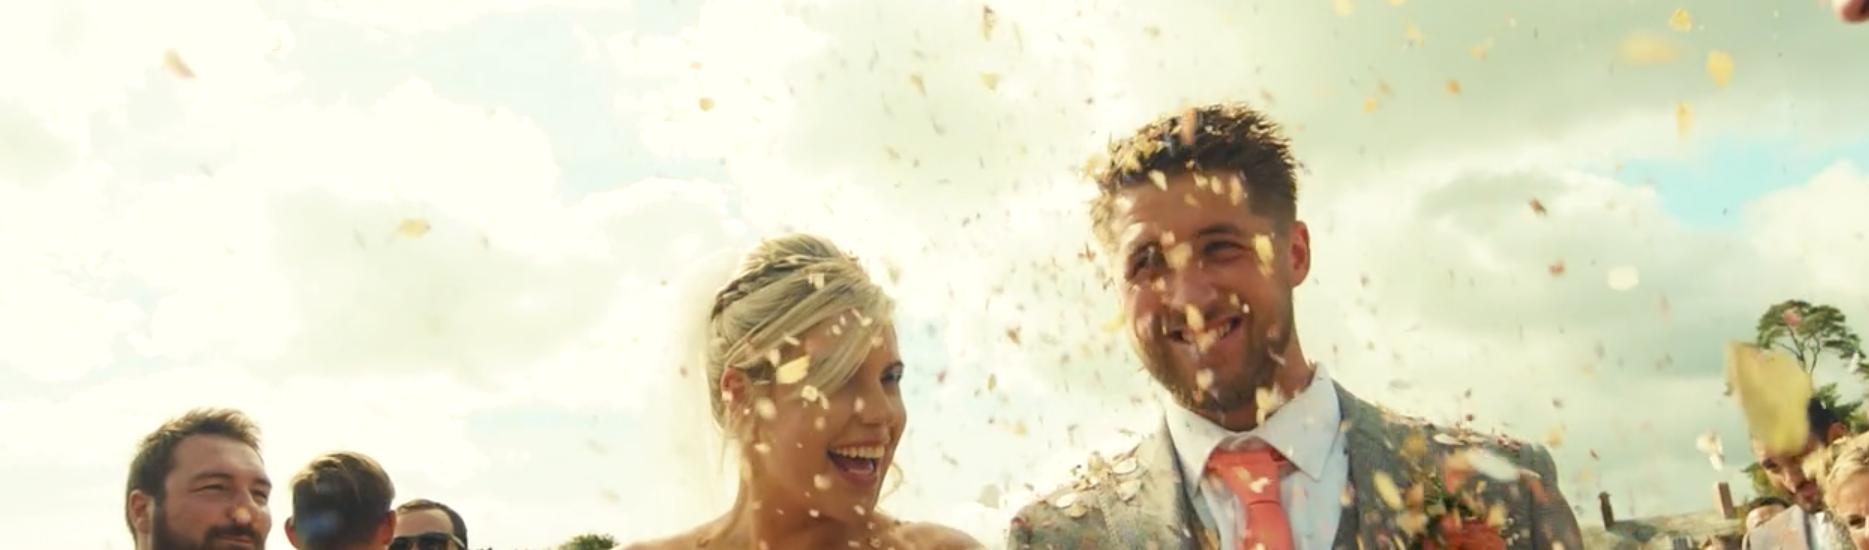 boconnoc wedding video